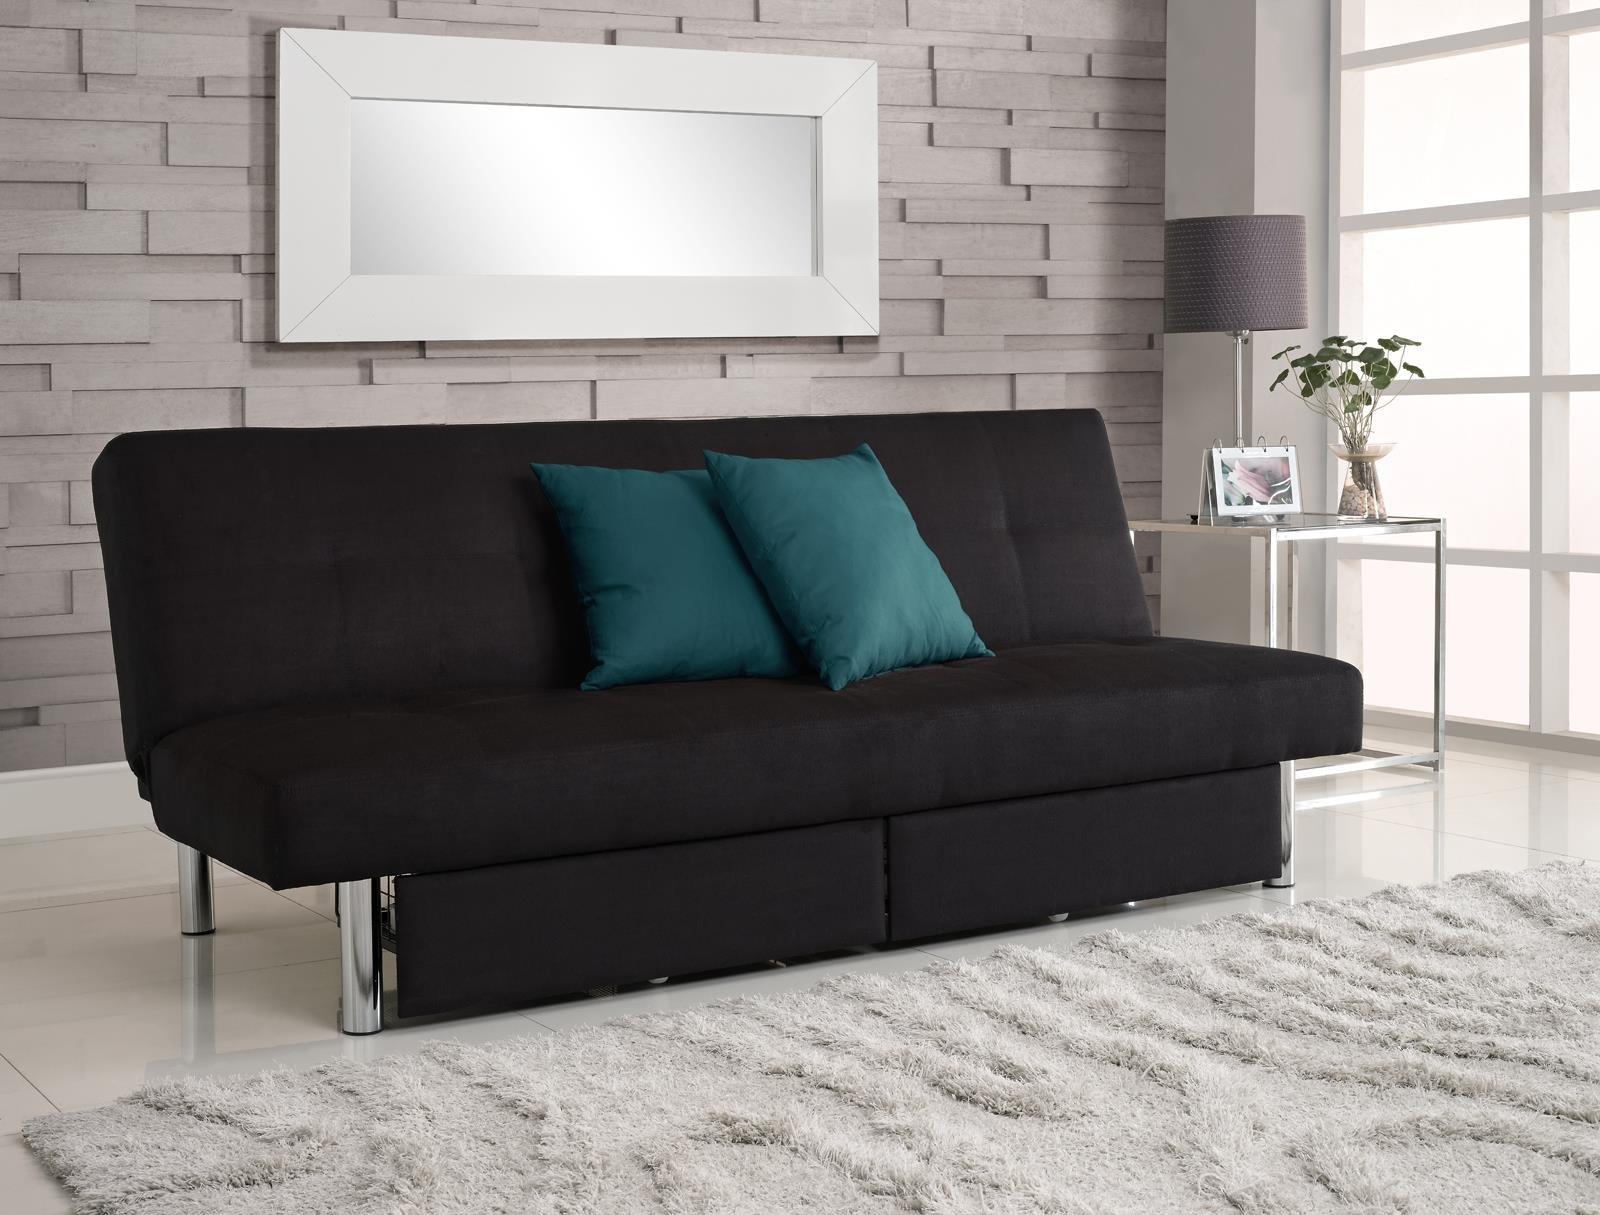 Cheap Sauder Studioedge Deshler Convertible Futon Sofa Find Sauder